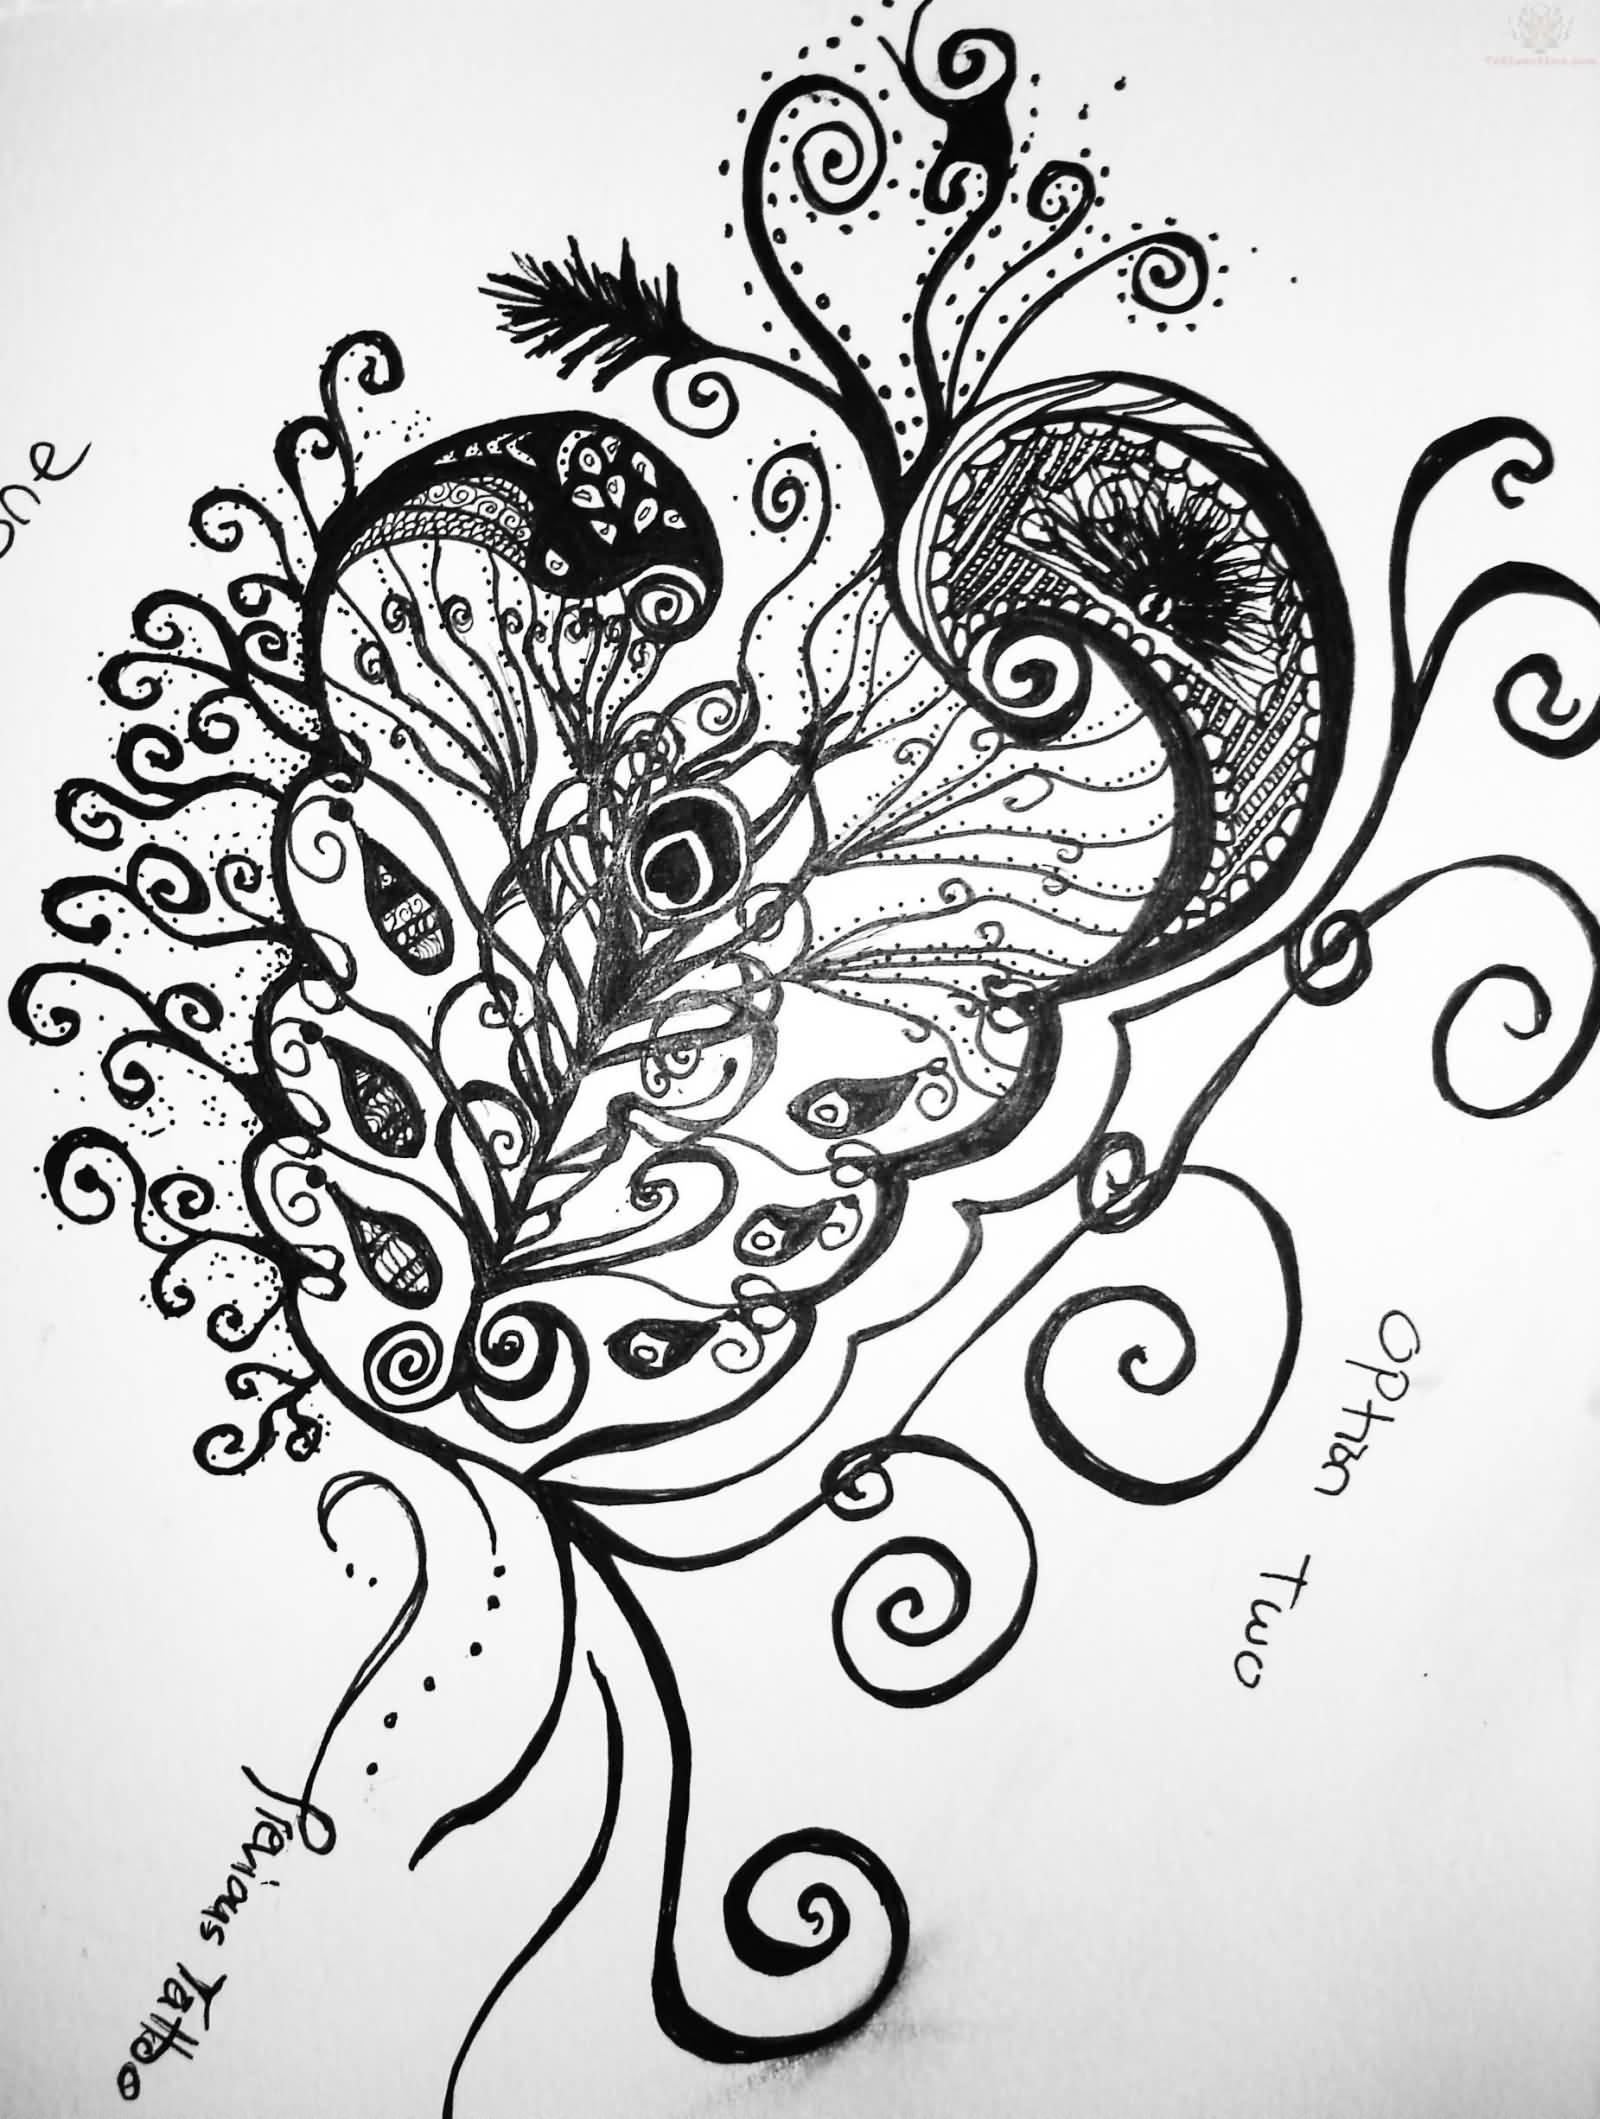 50 paisley pattern tattoos designs. Black Bedroom Furniture Sets. Home Design Ideas